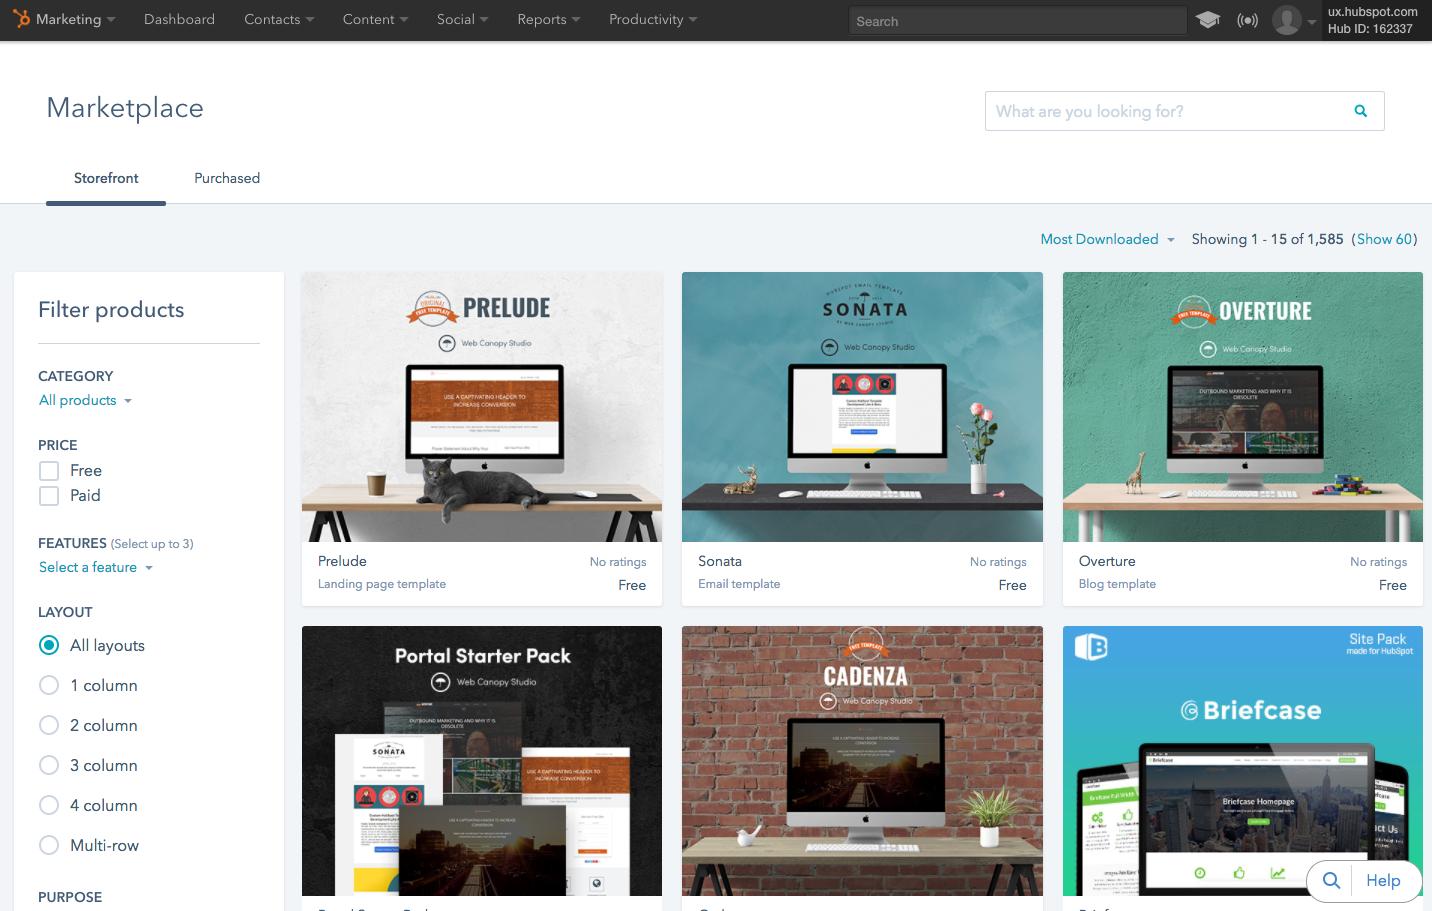 hubspot visual refresh app by app progress report. Black Bedroom Furniture Sets. Home Design Ideas